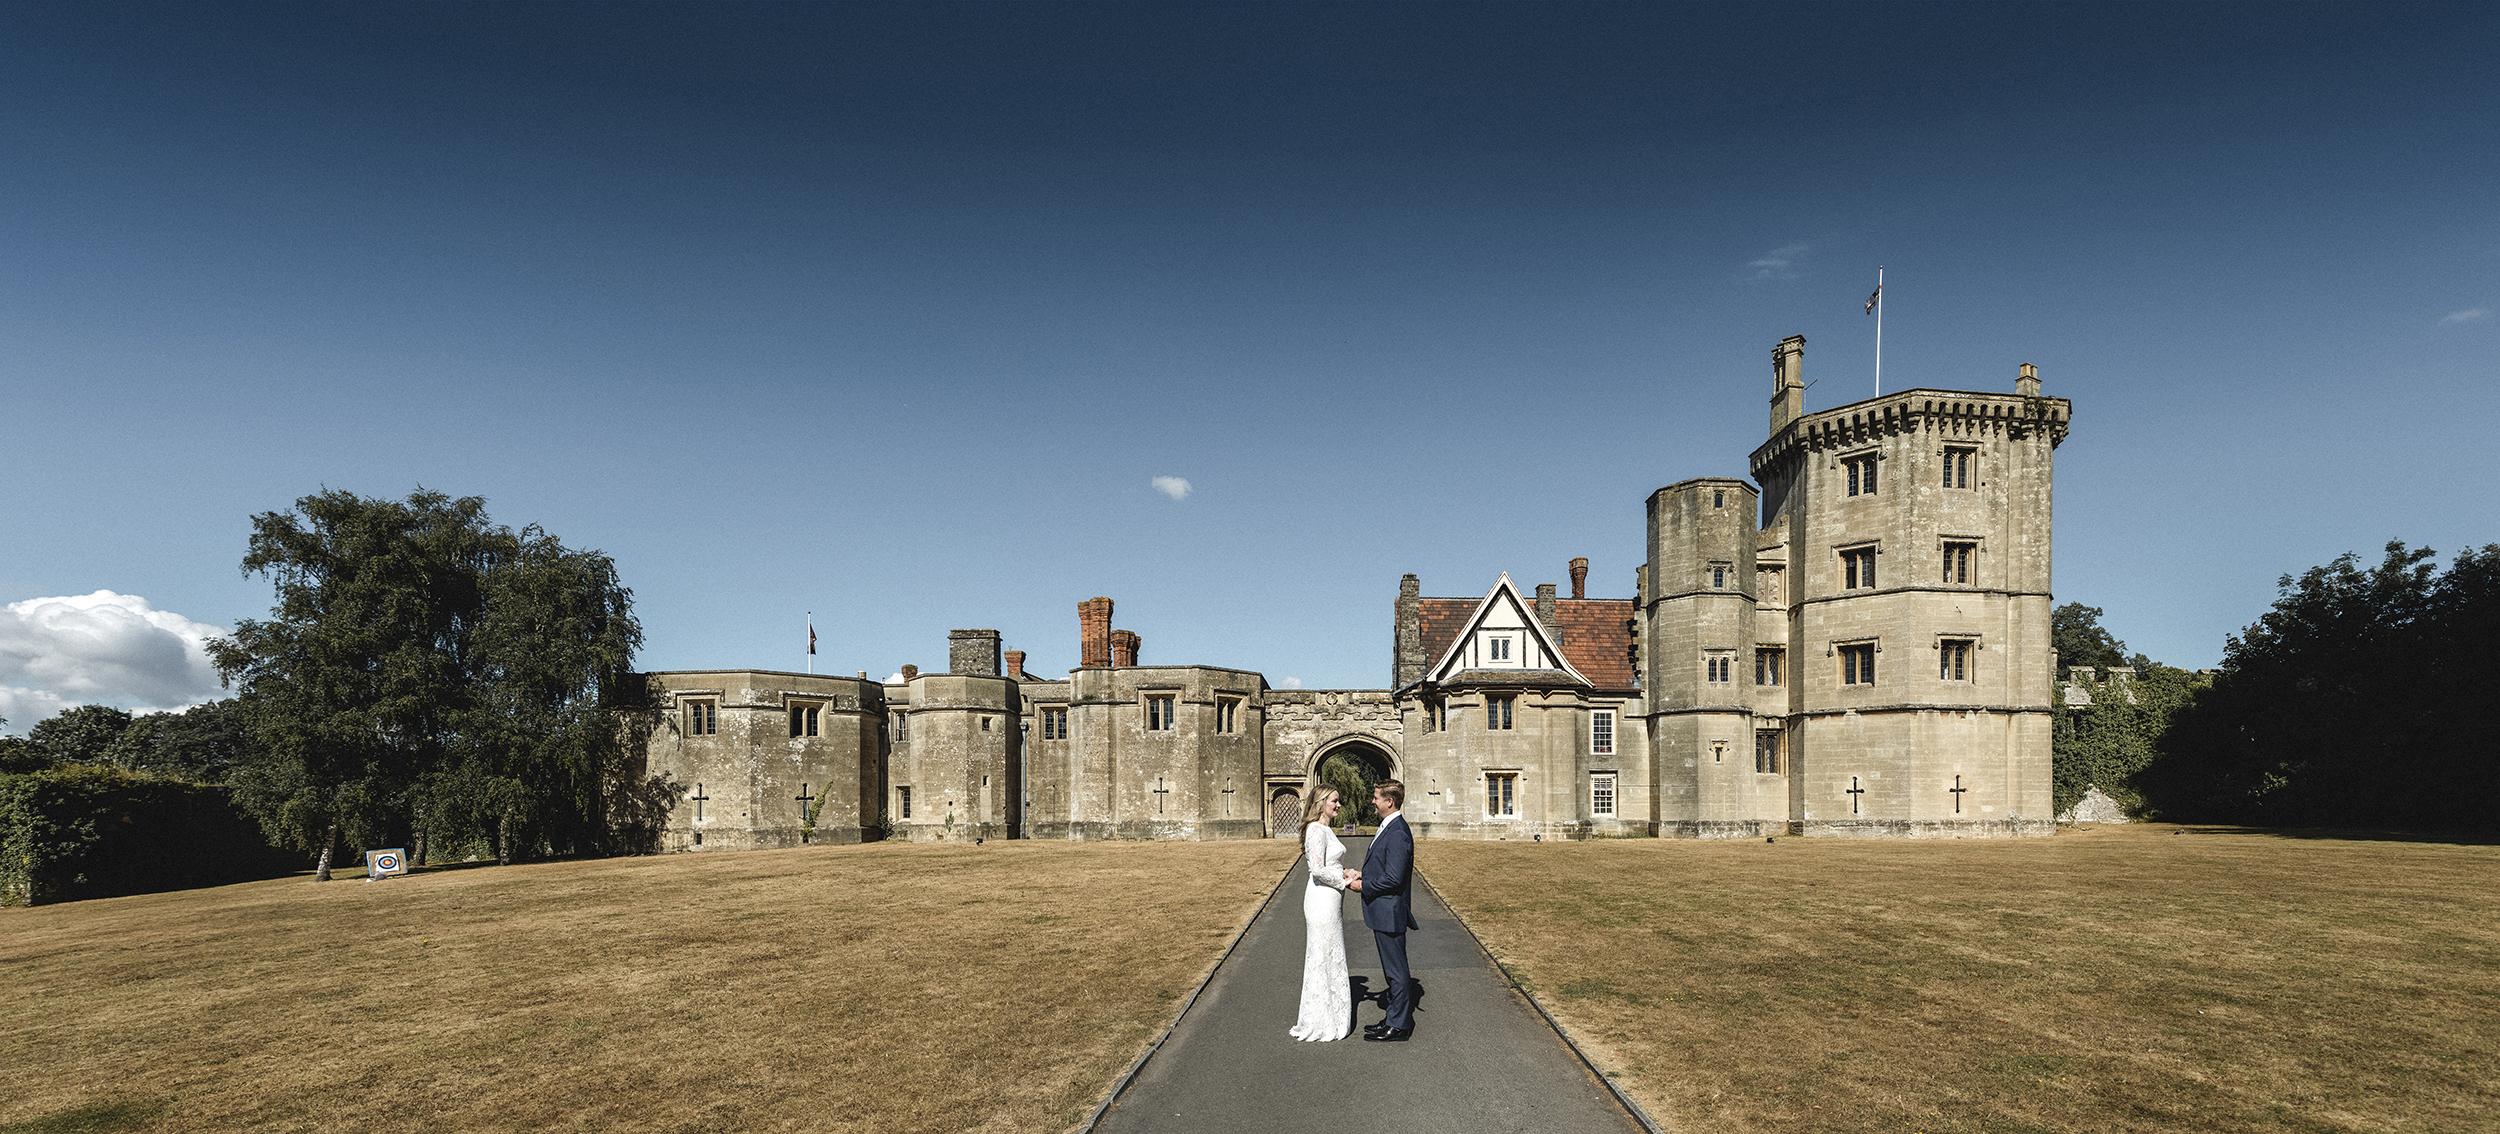 Thornbury_Castle_12.jpg